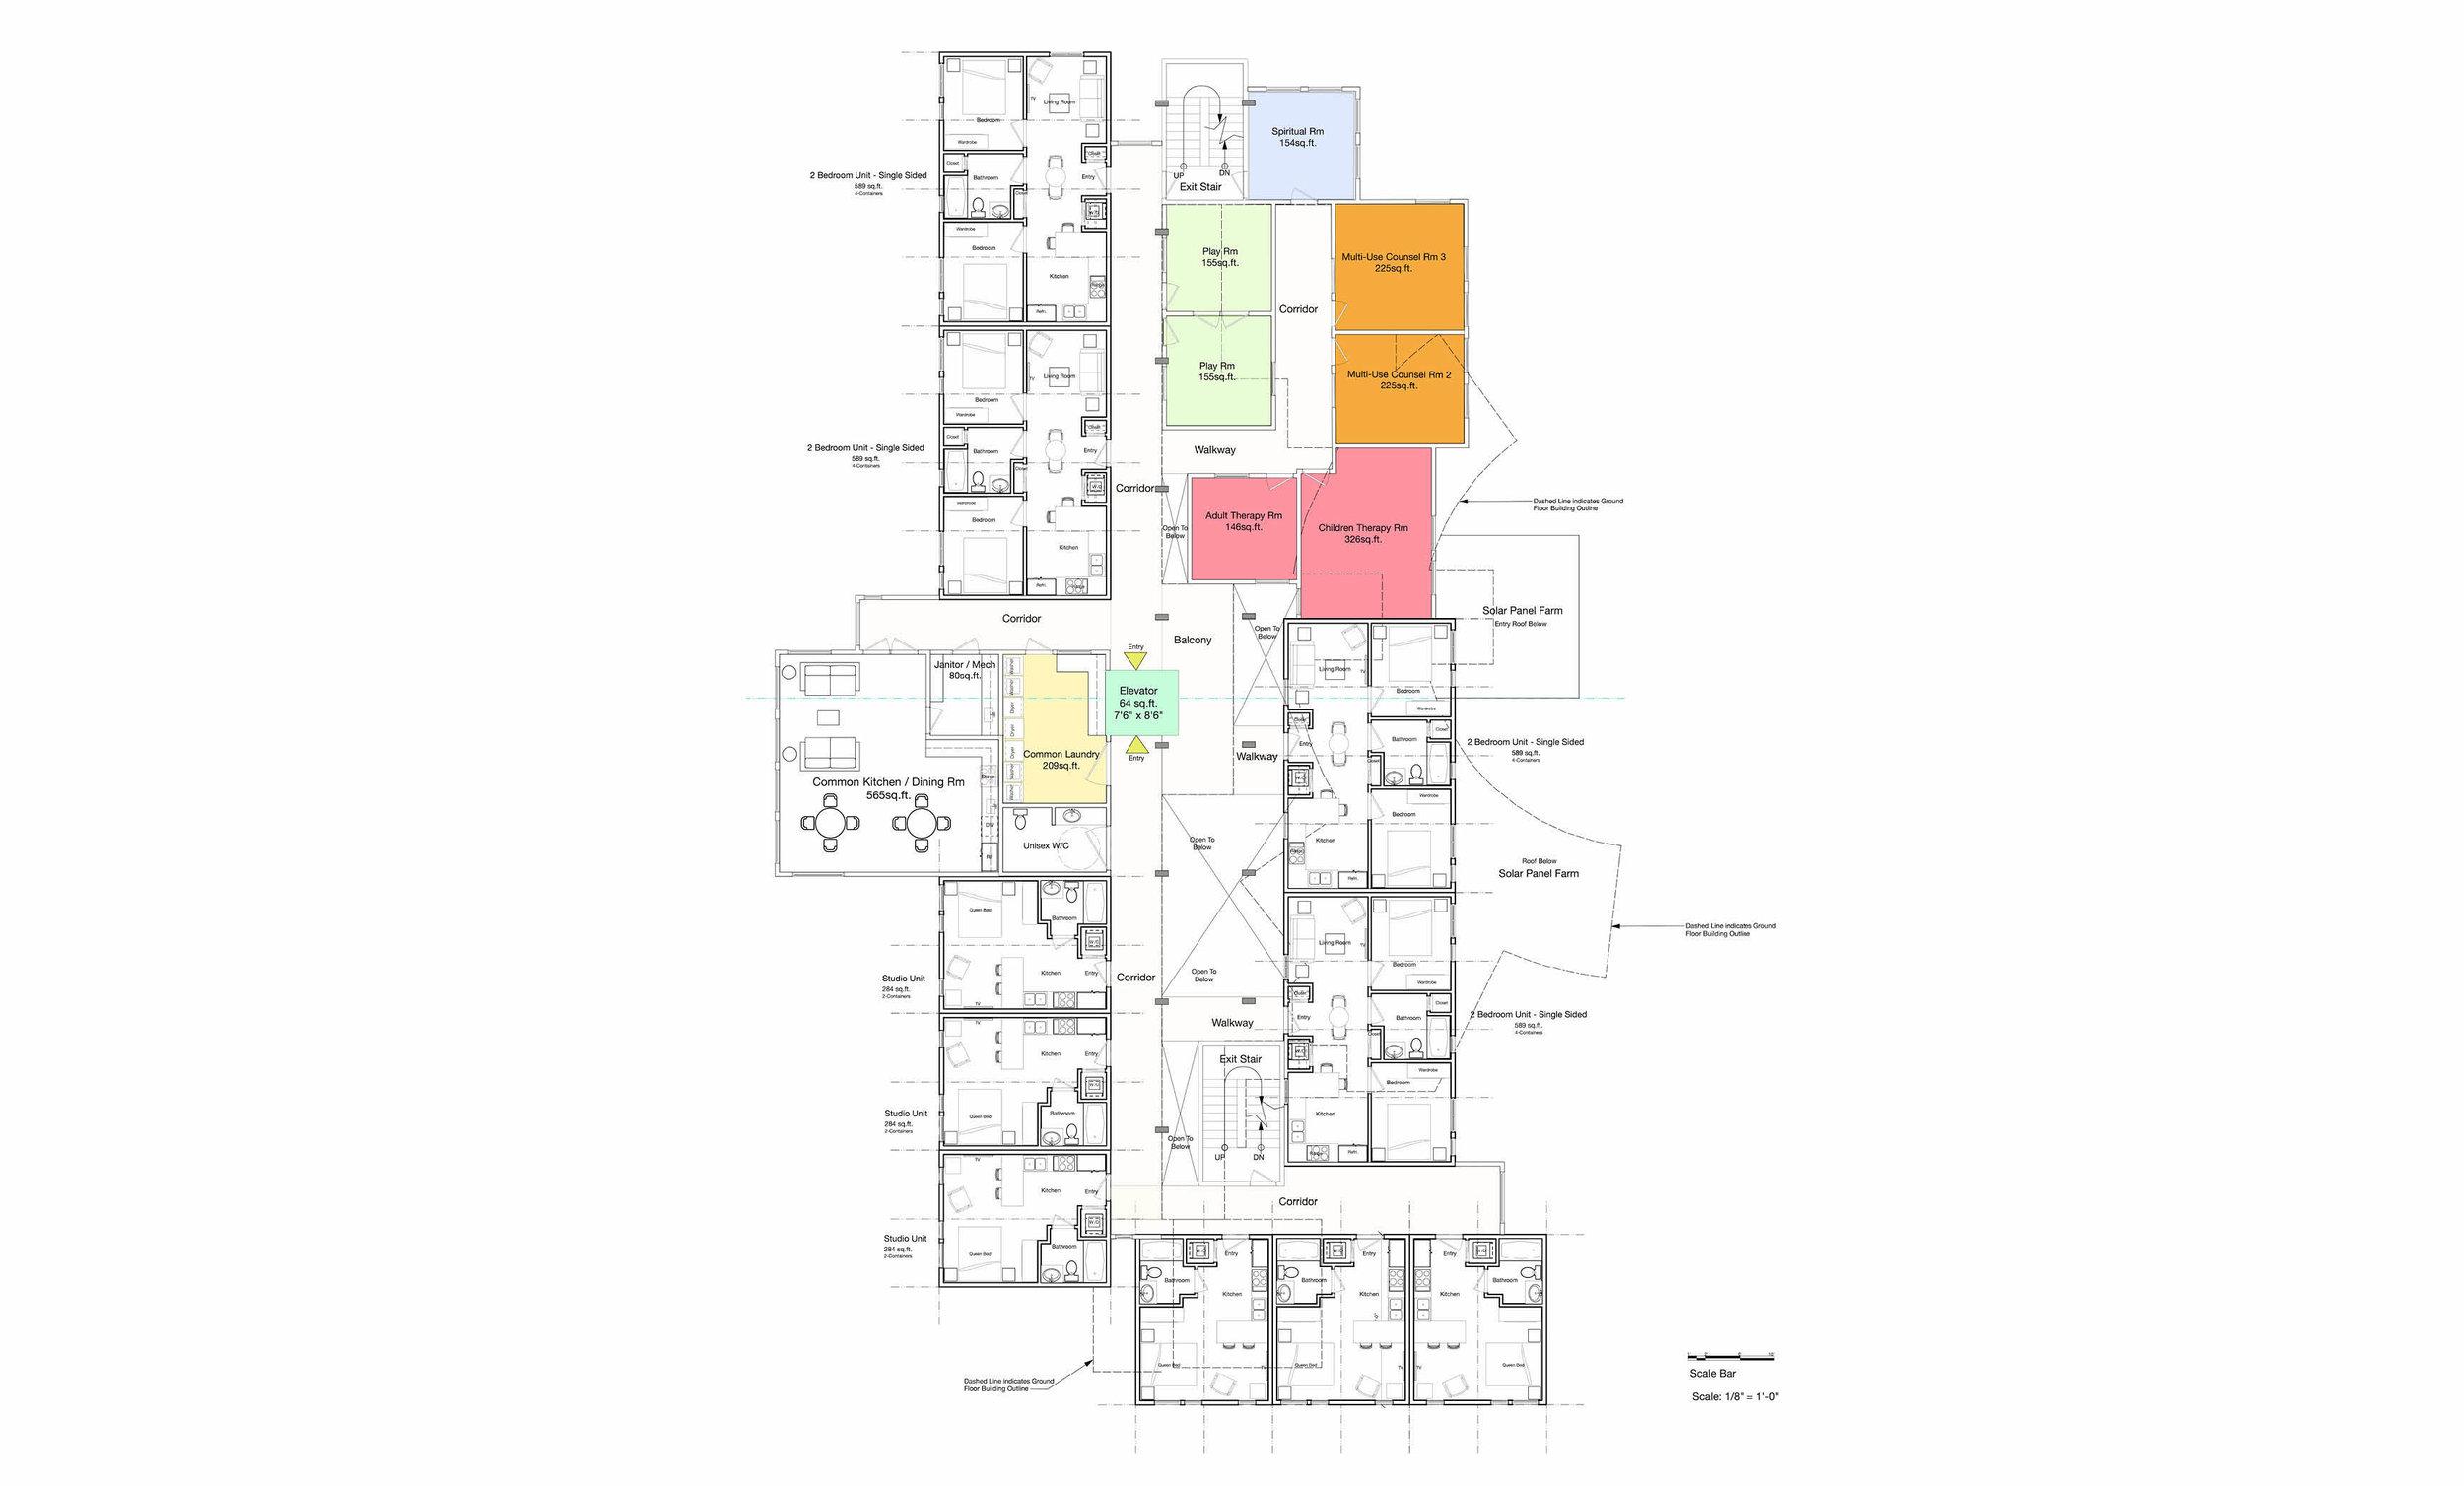 Higher Ground -Alternate Second + Third Floor Program consolidated on Second Floor